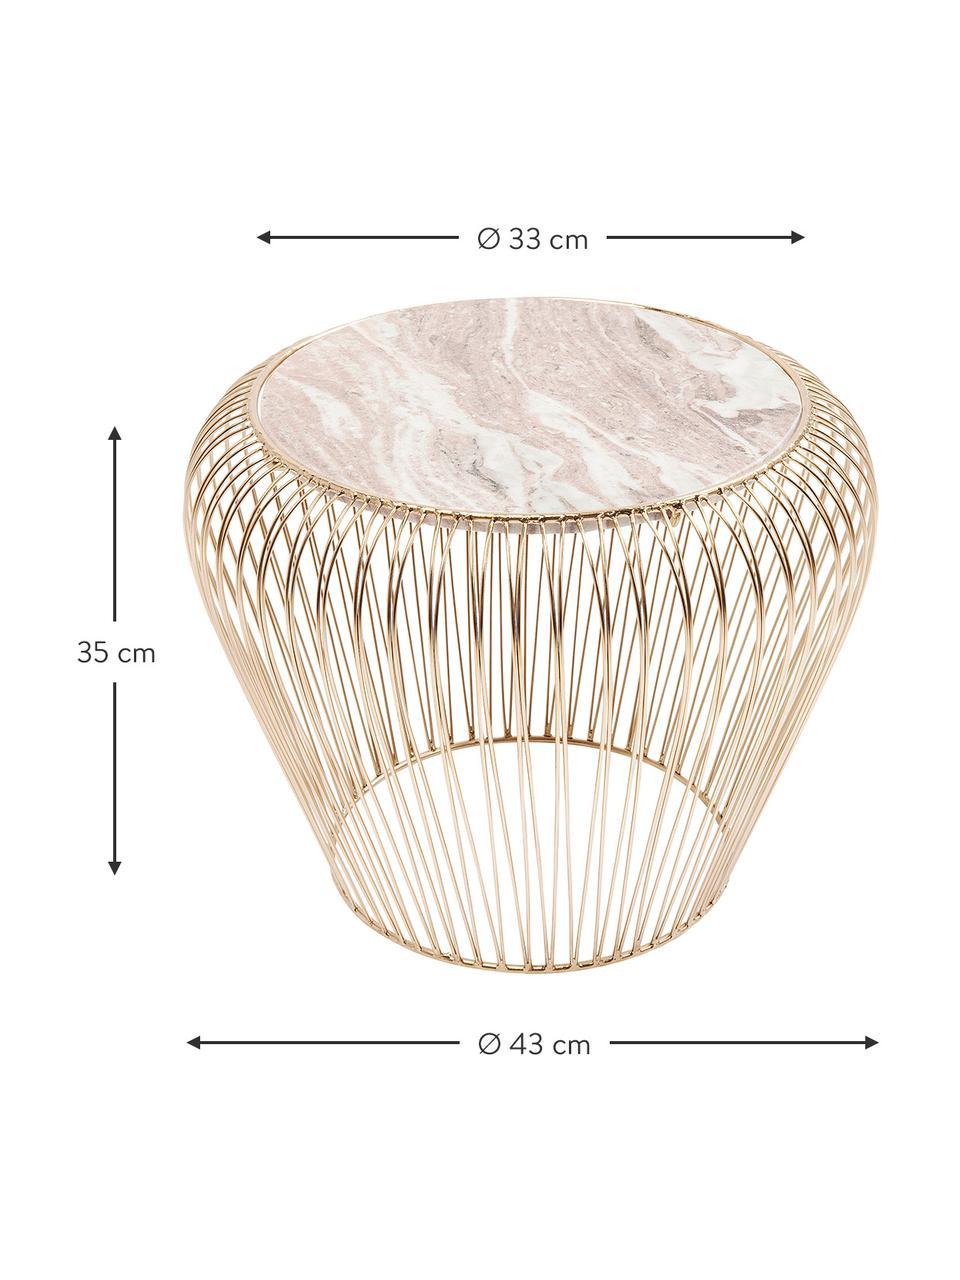 XS Beistelltisch Beam mit Marmor-Platte, Gestell: Metall, vermessingt, Tischplatte: Marmor, Grau, Ø 43 x H 35 cm